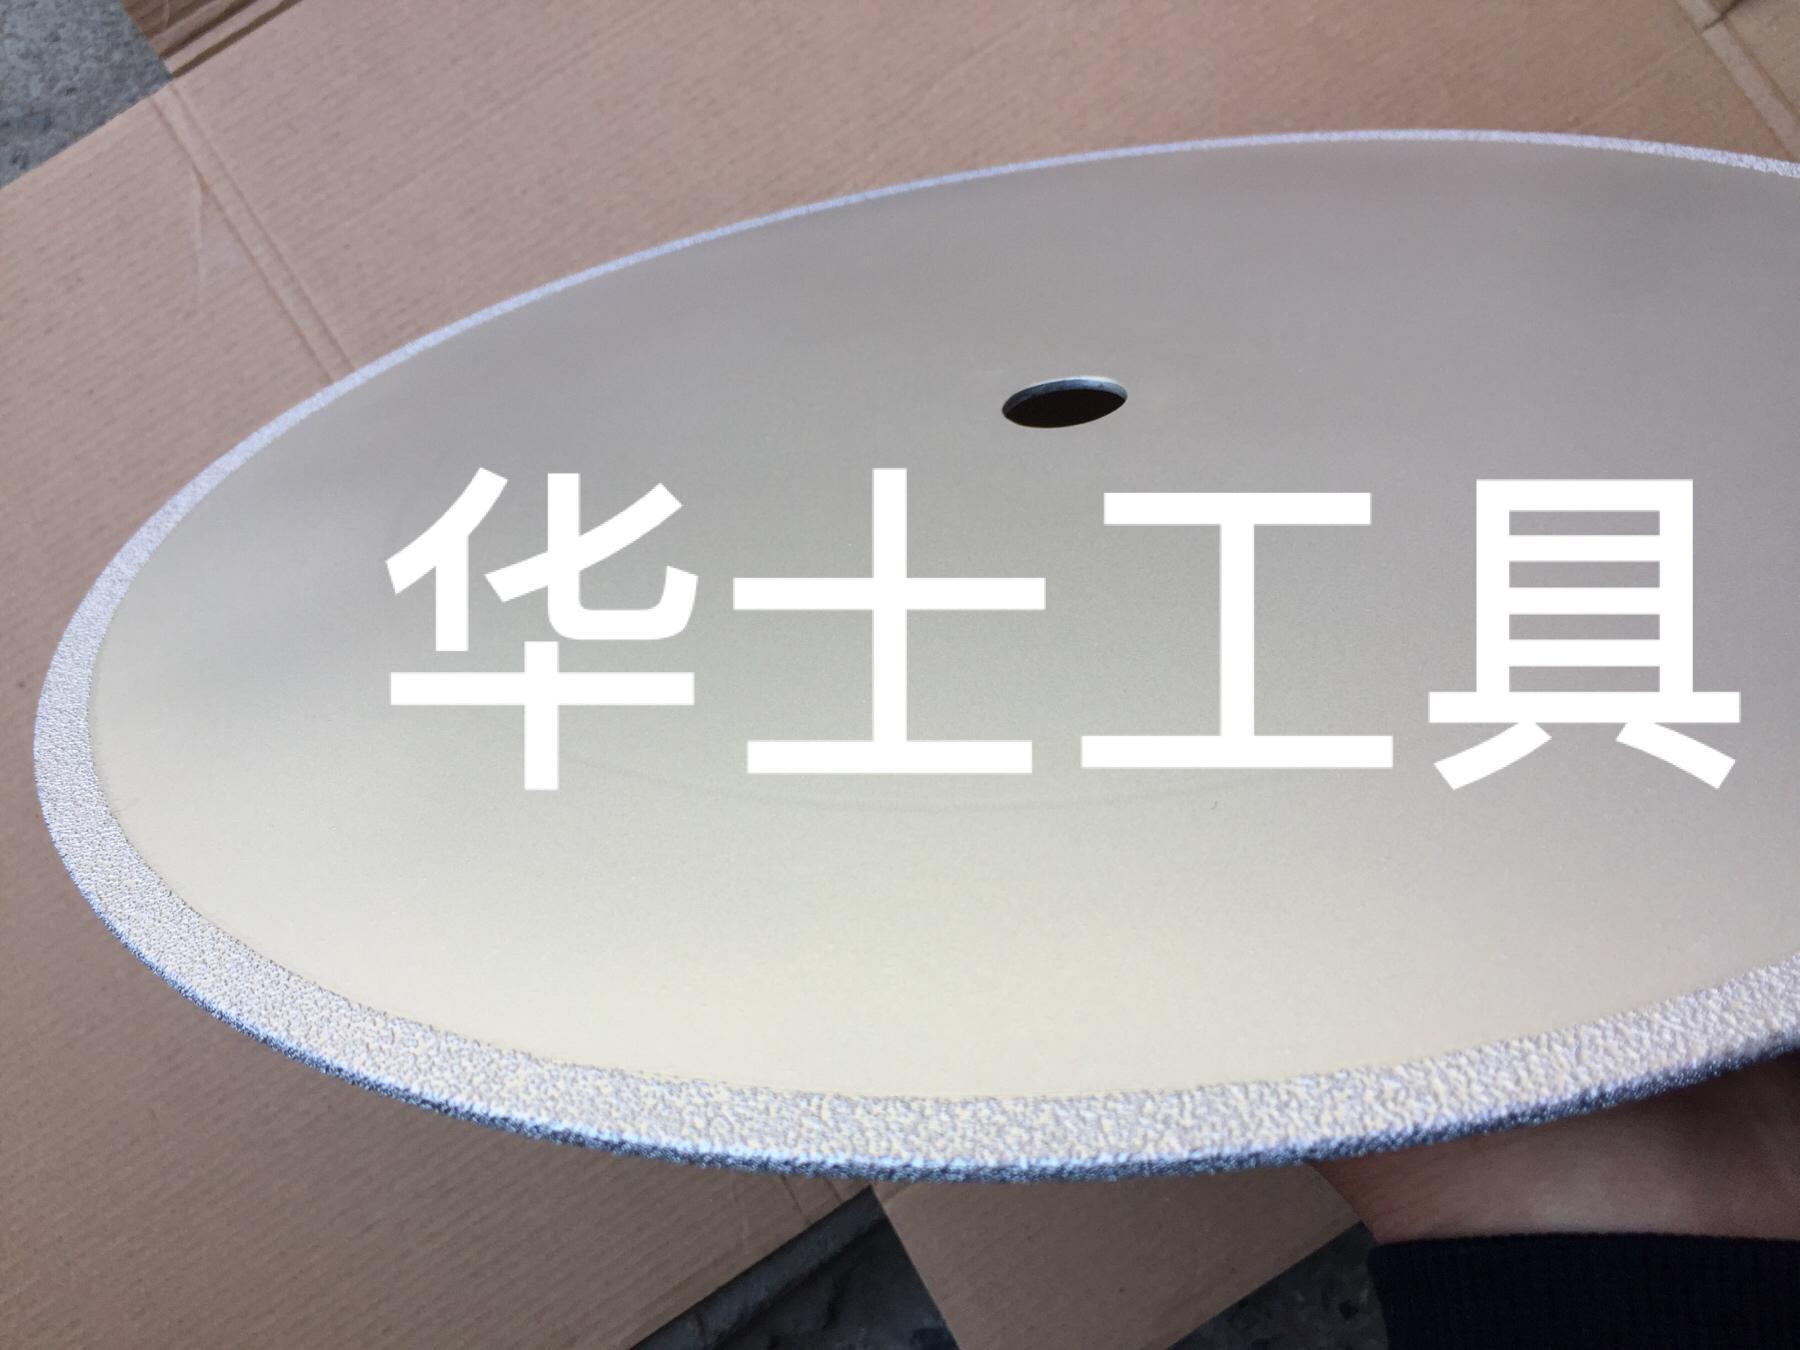 Acrylic-Diamond saw blade   Sanitary appliance -Diamond saw blade  5